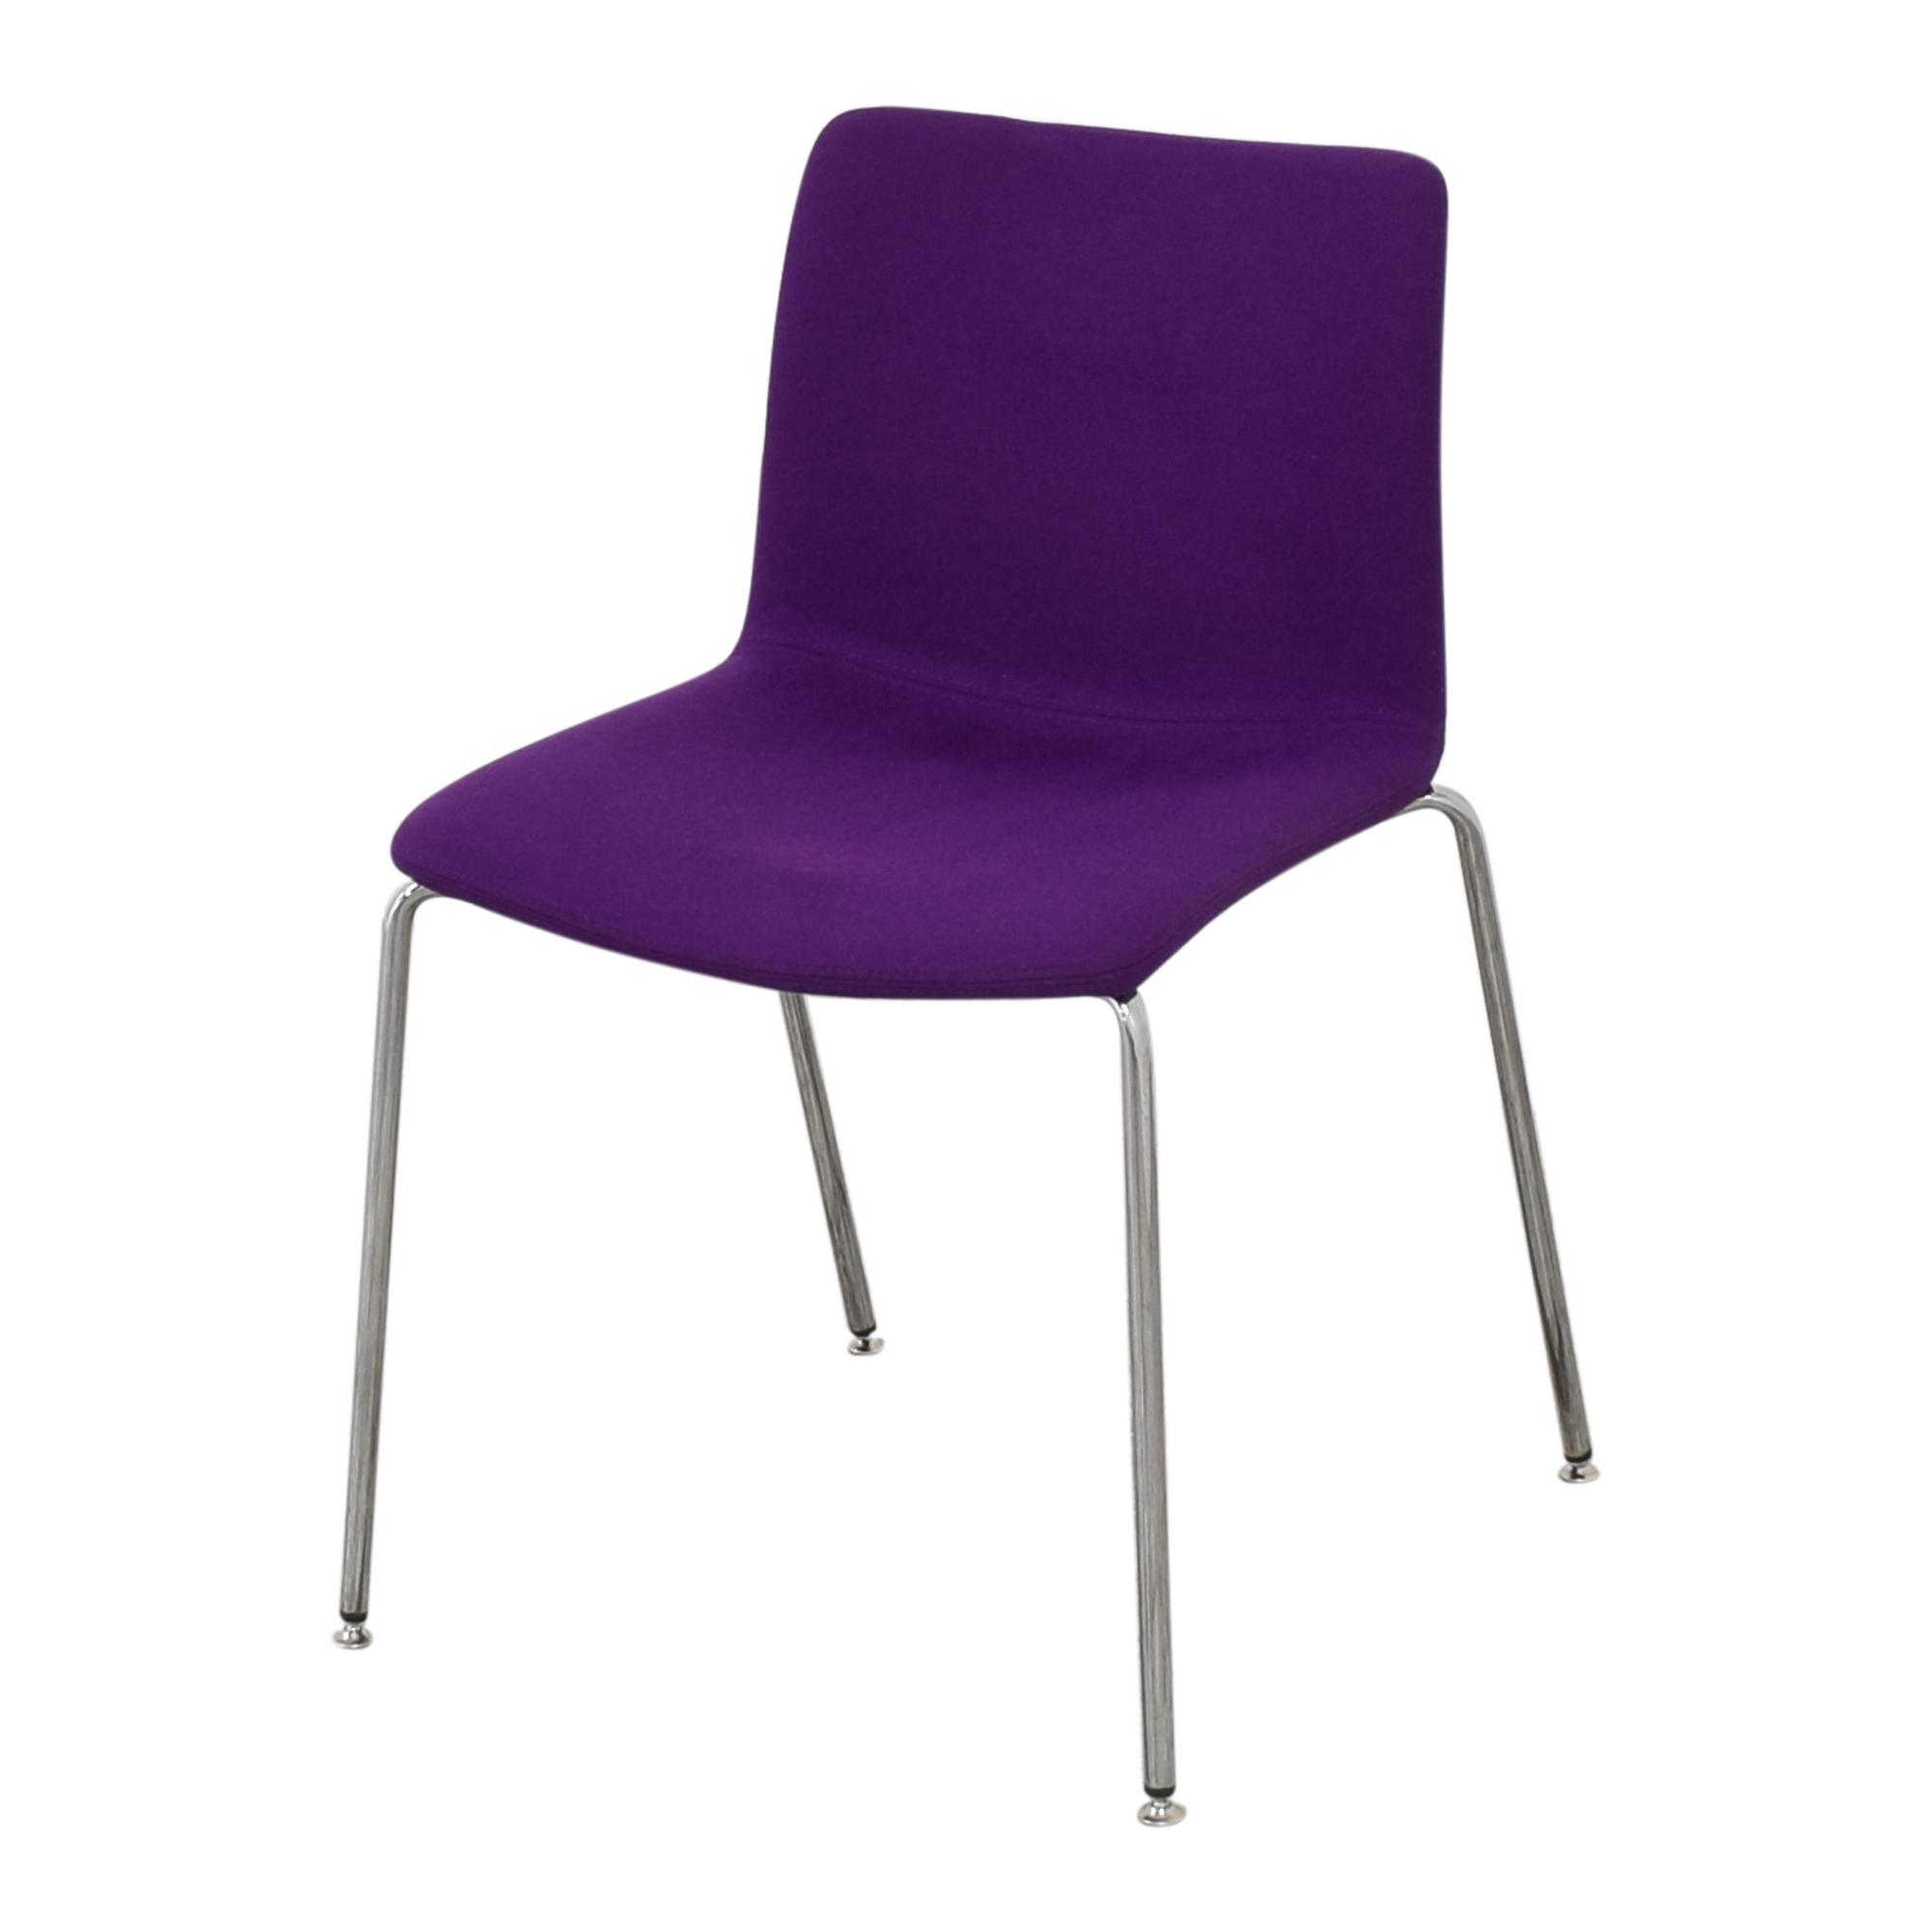 Koleksiyon Koleksiyon Helen Armless Chair pa